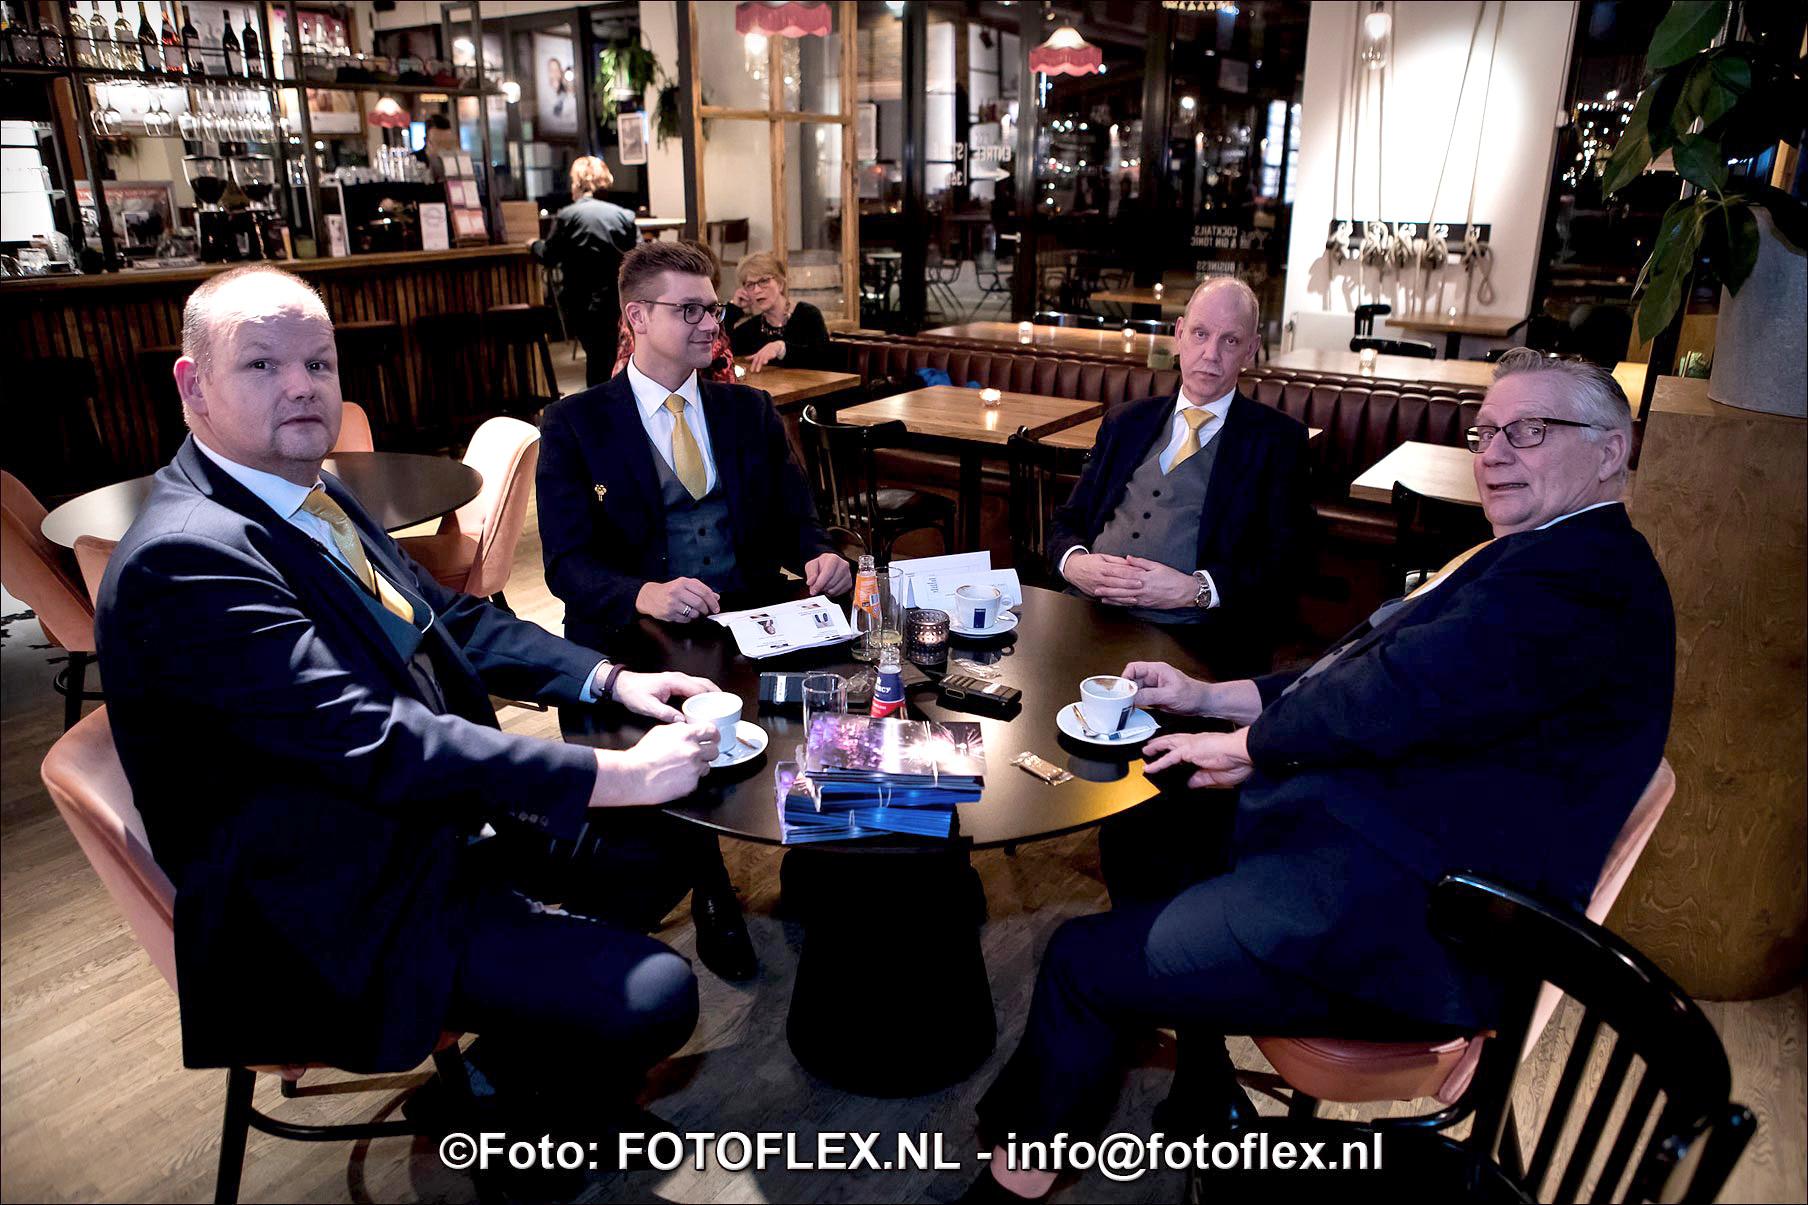 0002-CopyrightFOTOFLEX.NL07012020